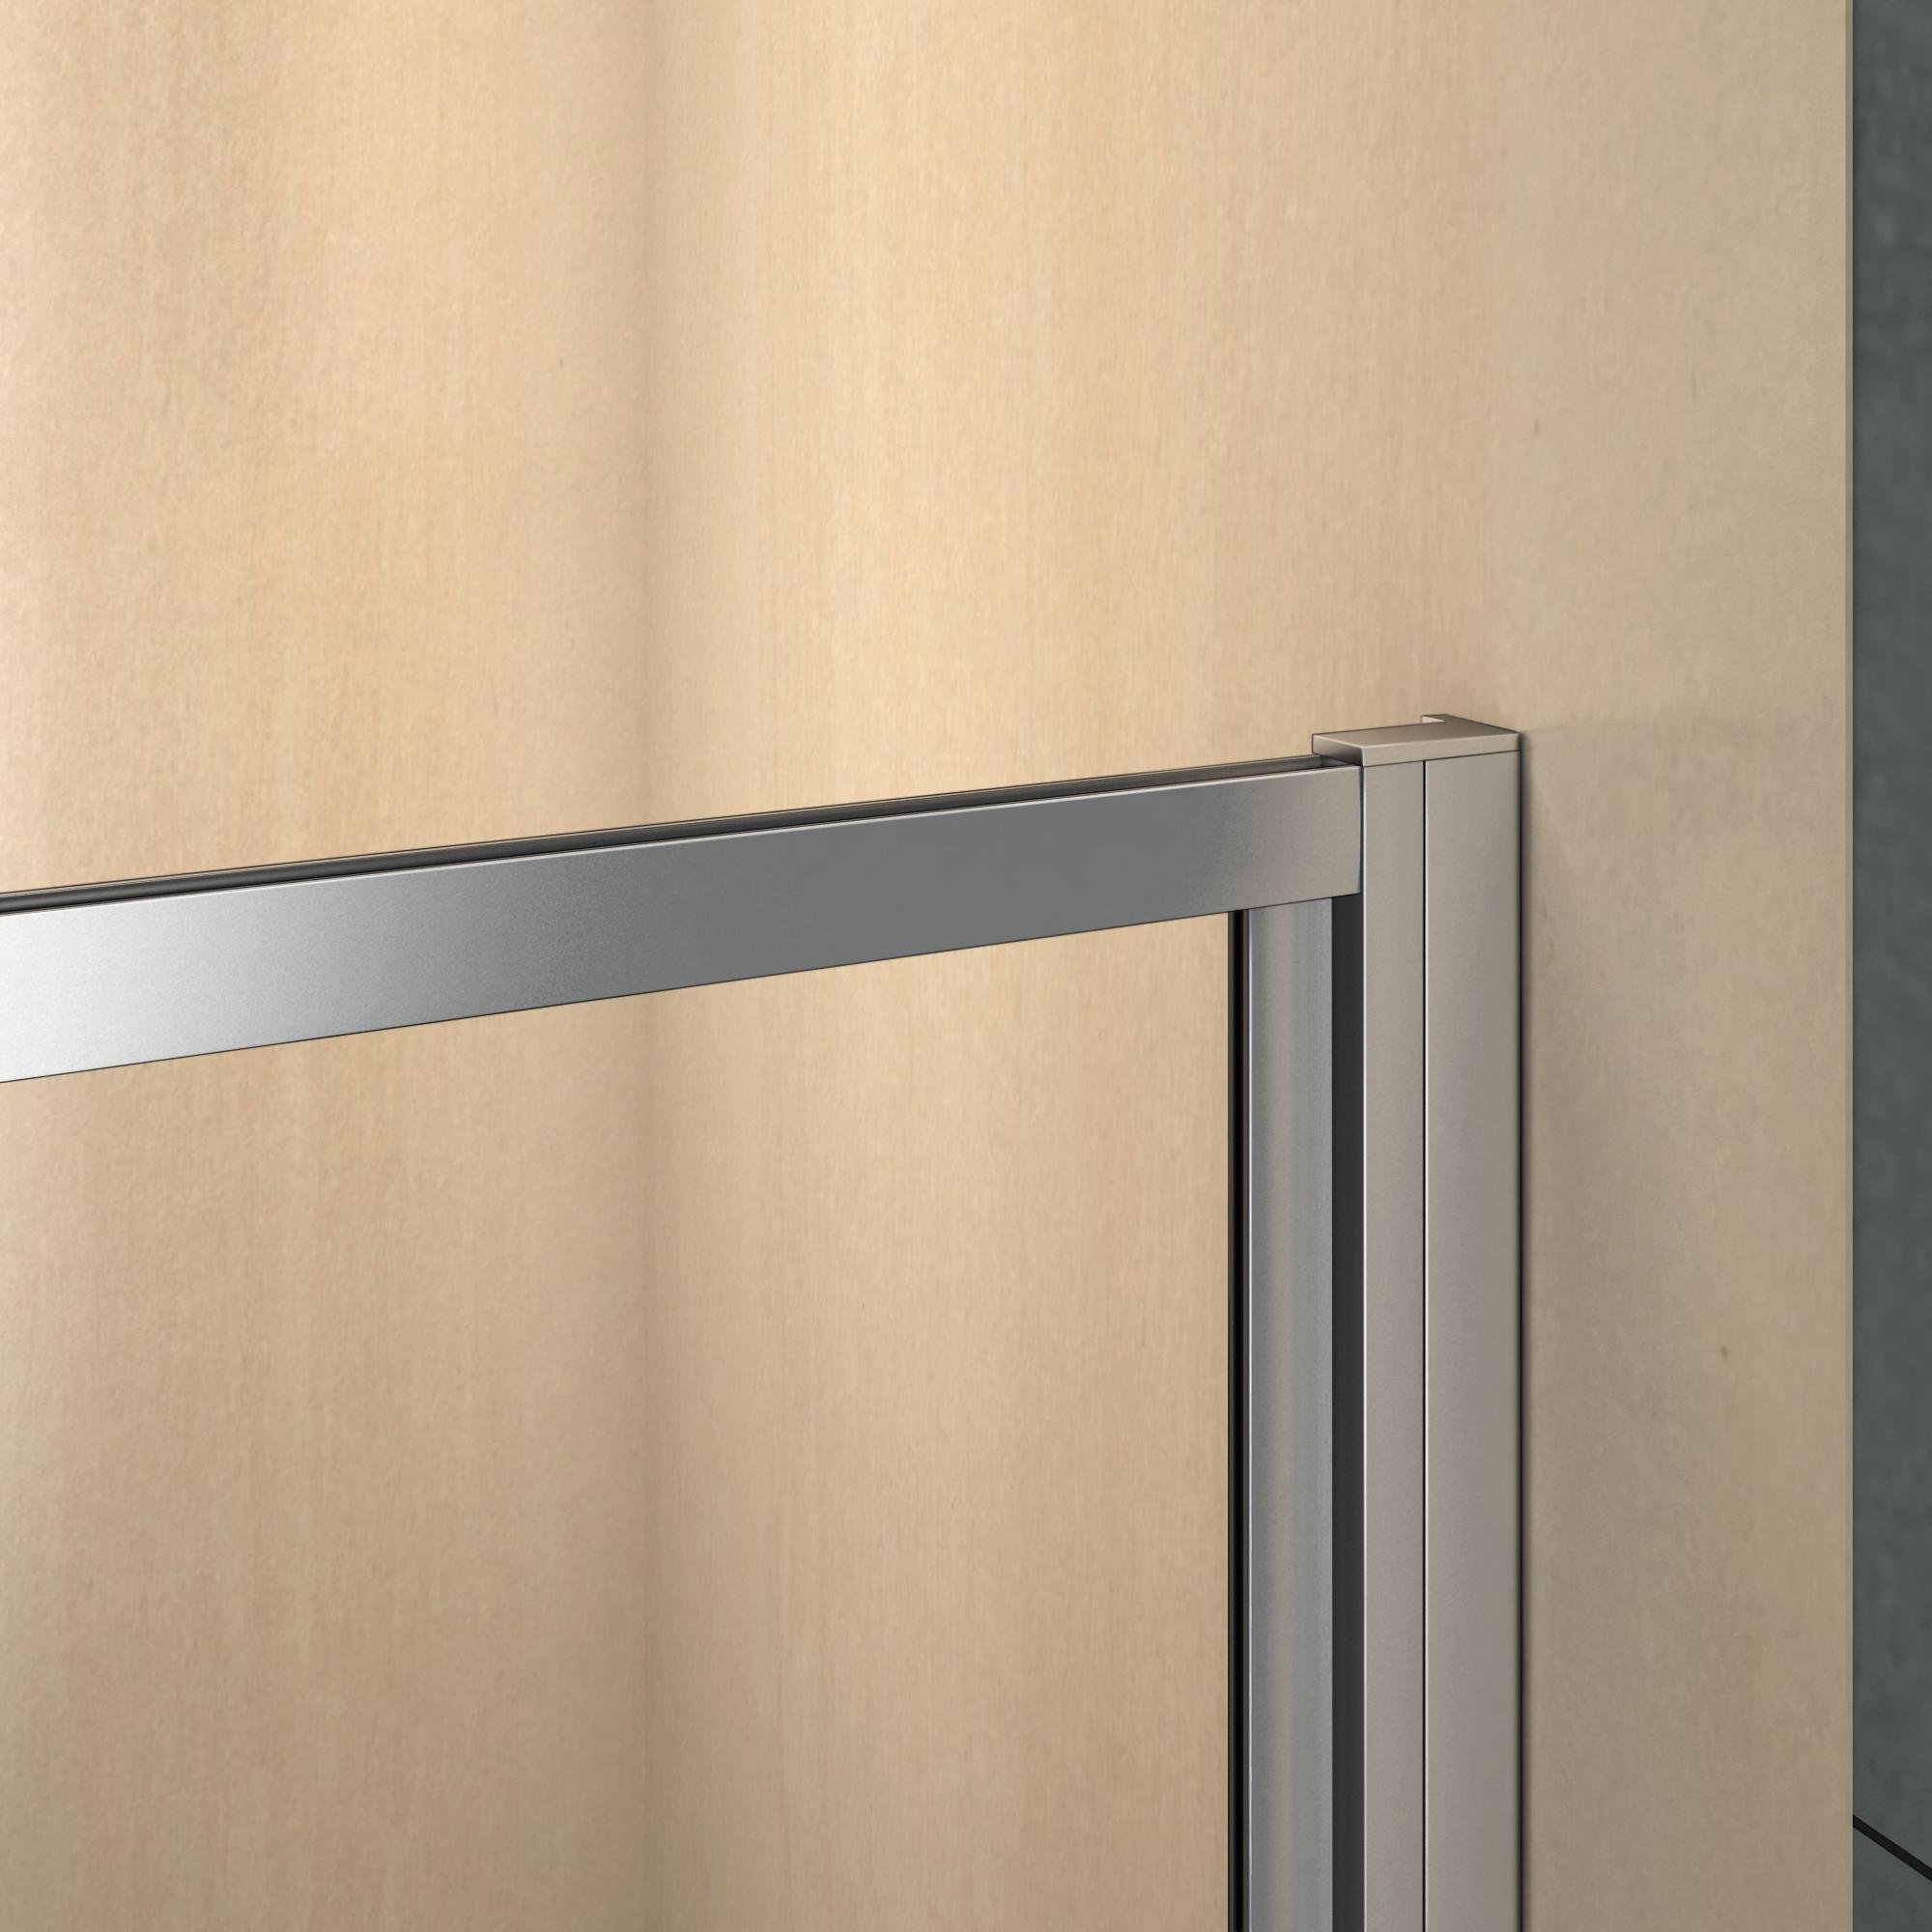 70 100cm duschkabine duschabtrennung faltt r esg duschwand dusche duschtasse brg ebay. Black Bedroom Furniture Sets. Home Design Ideas